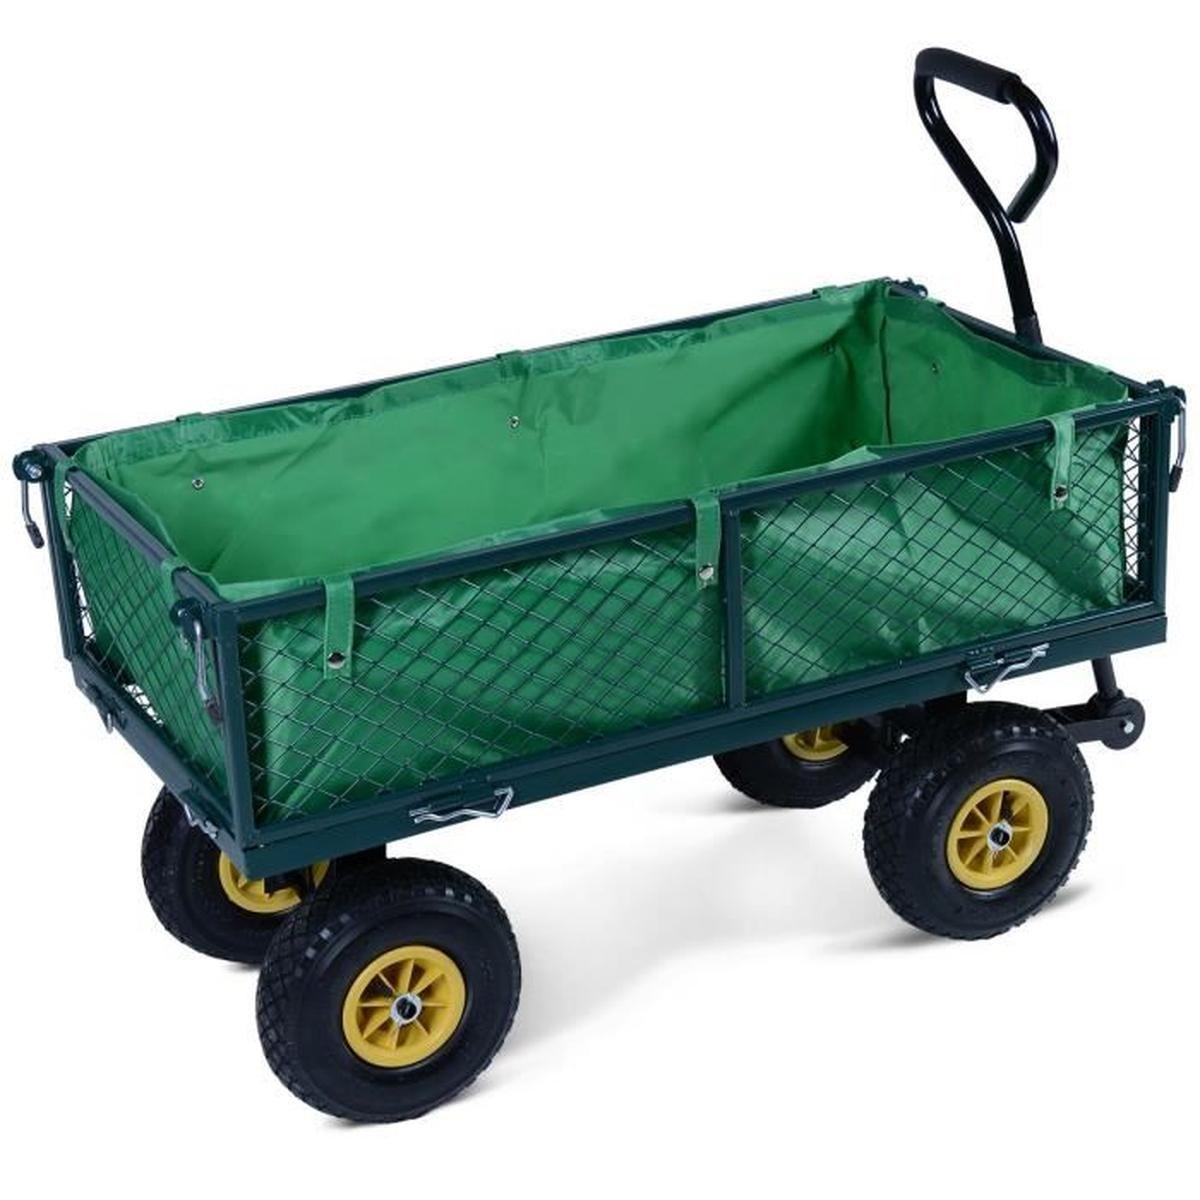 Chariot De Transport Jardin Charette Chariot Remorque À Main ... serapportantà Remorque A Jardin